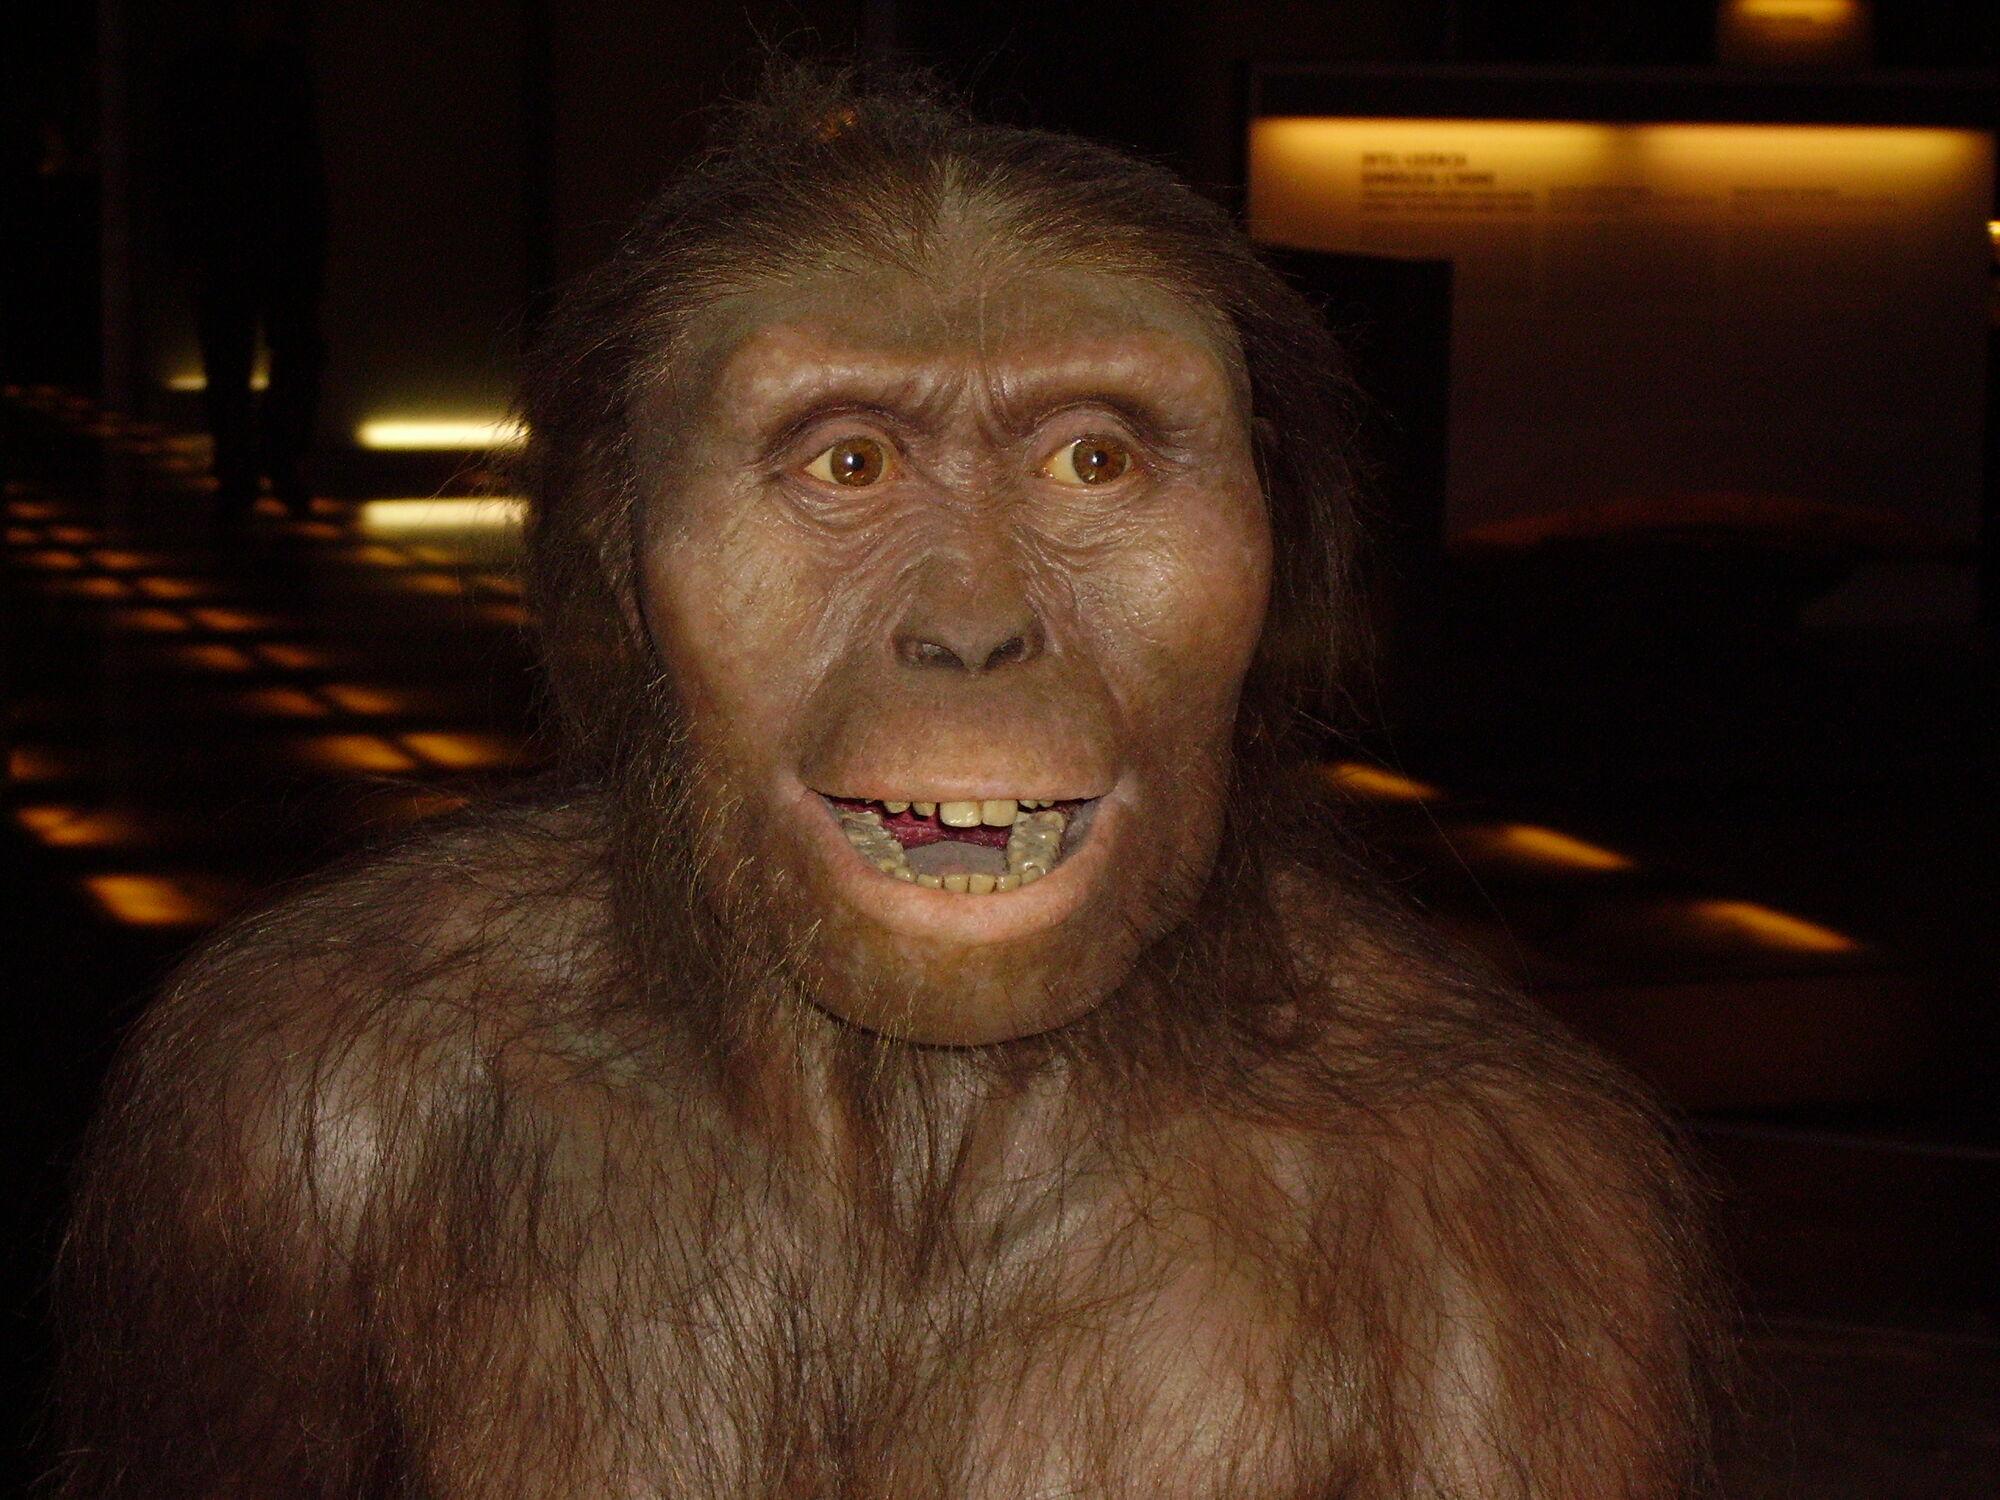 Potassium argon dating hominids lucy